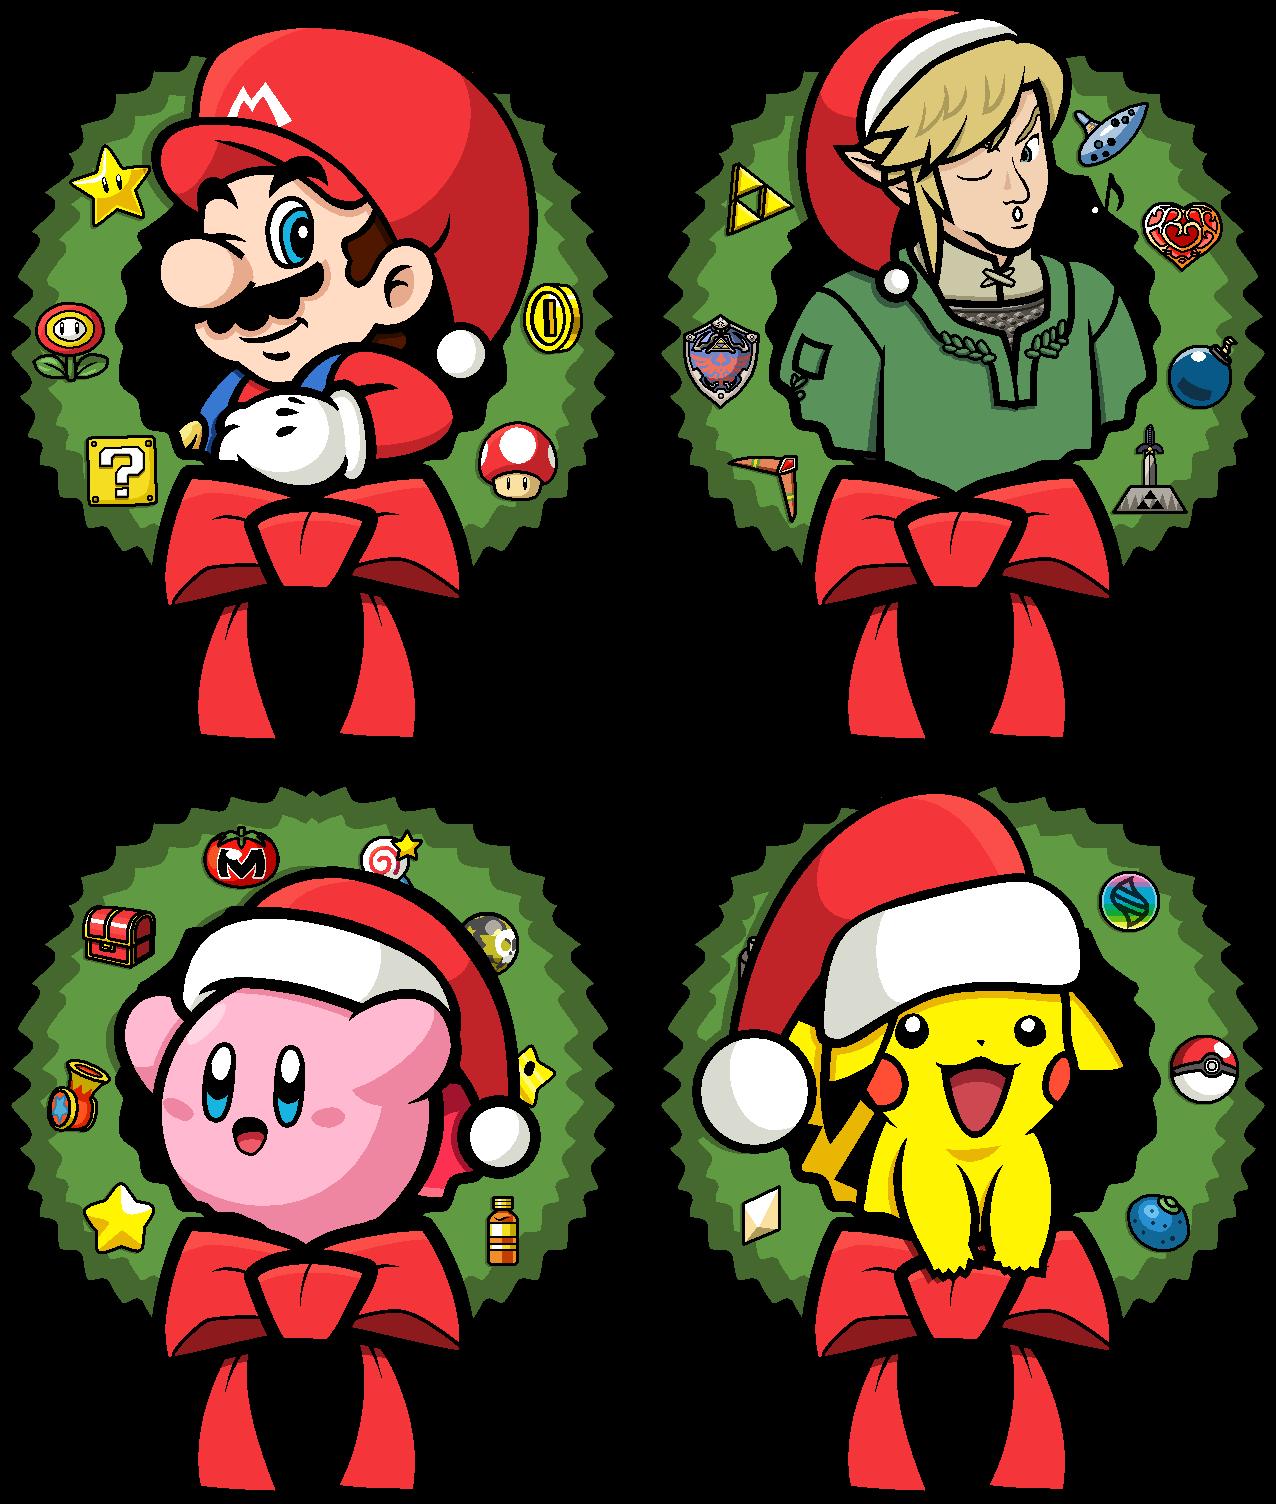 Super christmas roster by Blistinaorgin on DeviantArt